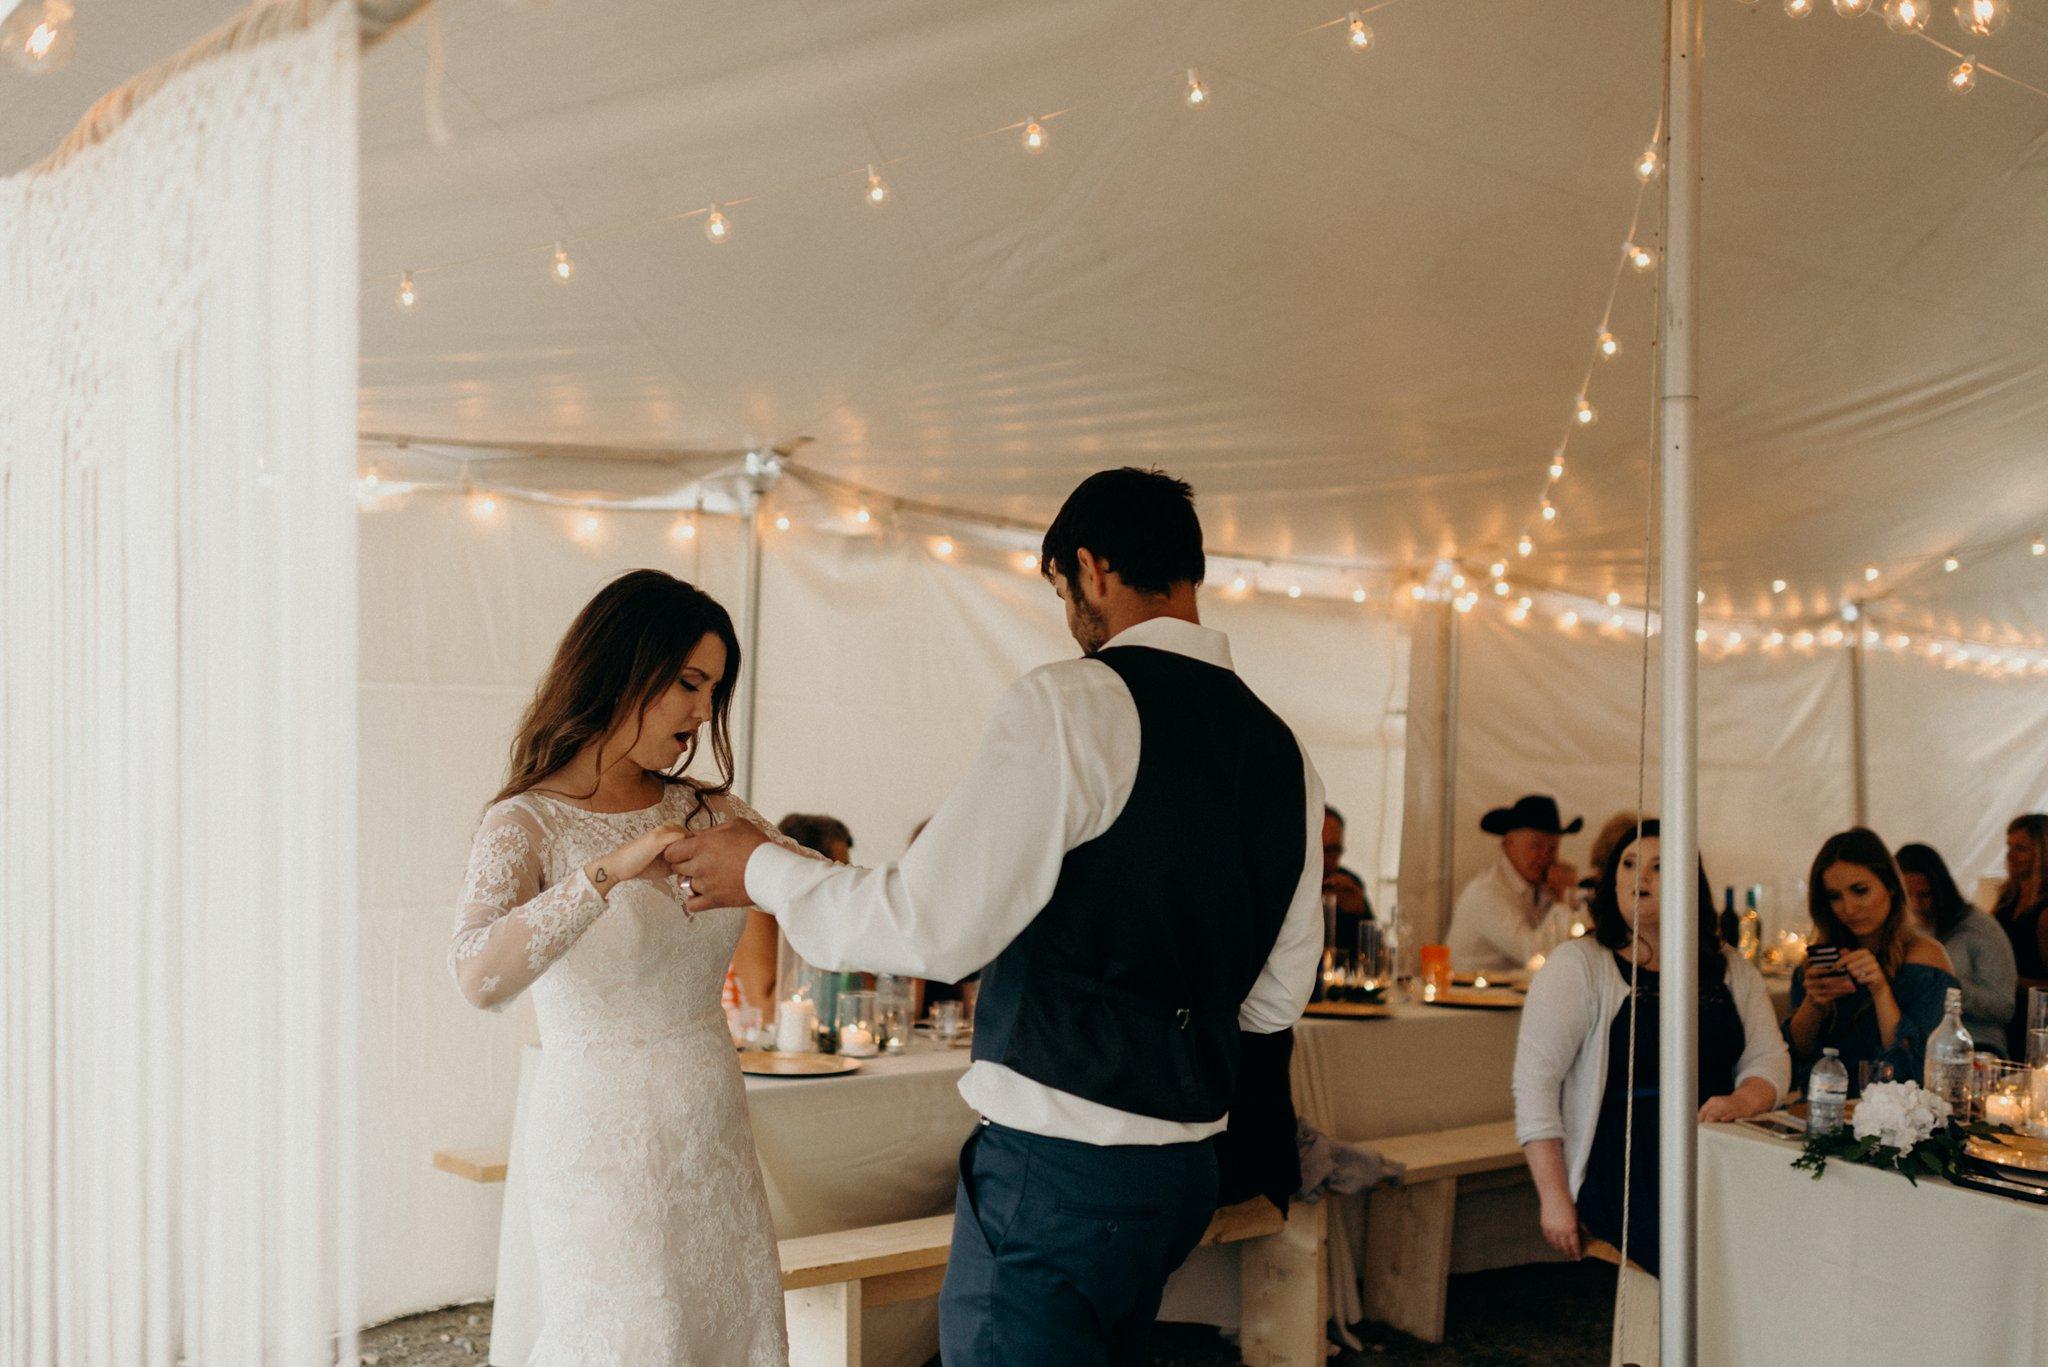 kaihla_tonai_intimate_wedding_elopement_photographer_6788.jpg